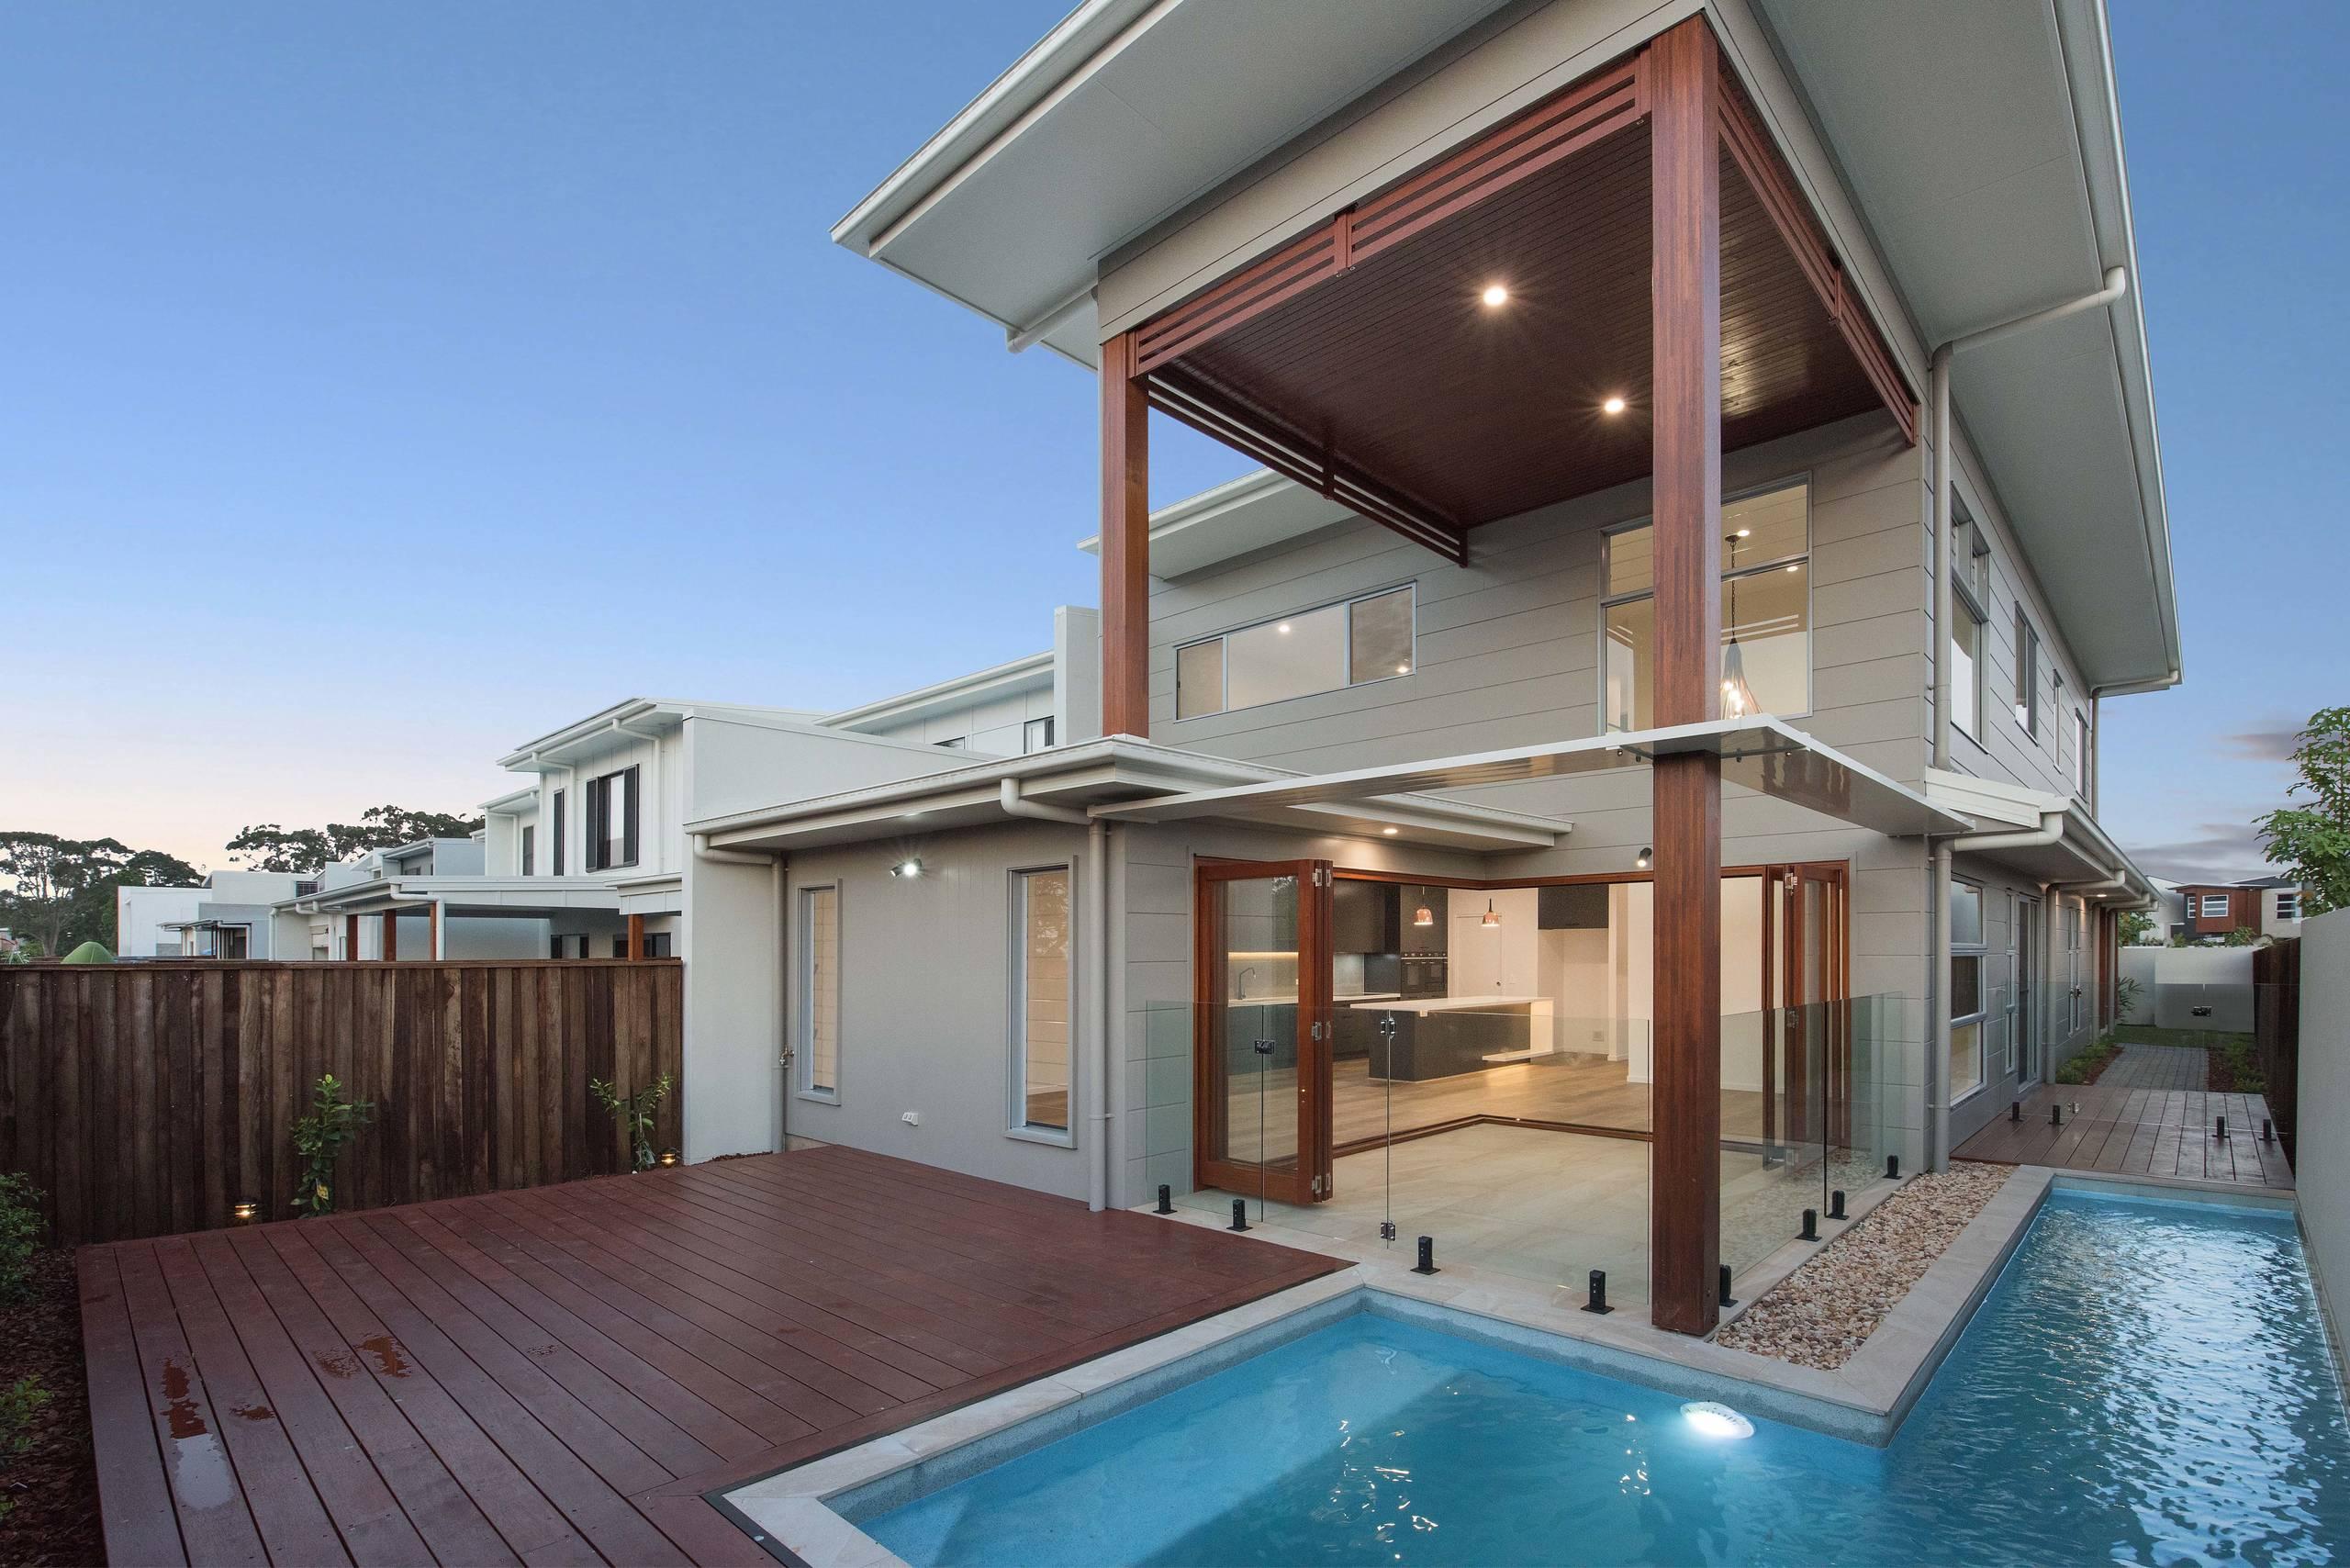 Deck & Pool Area